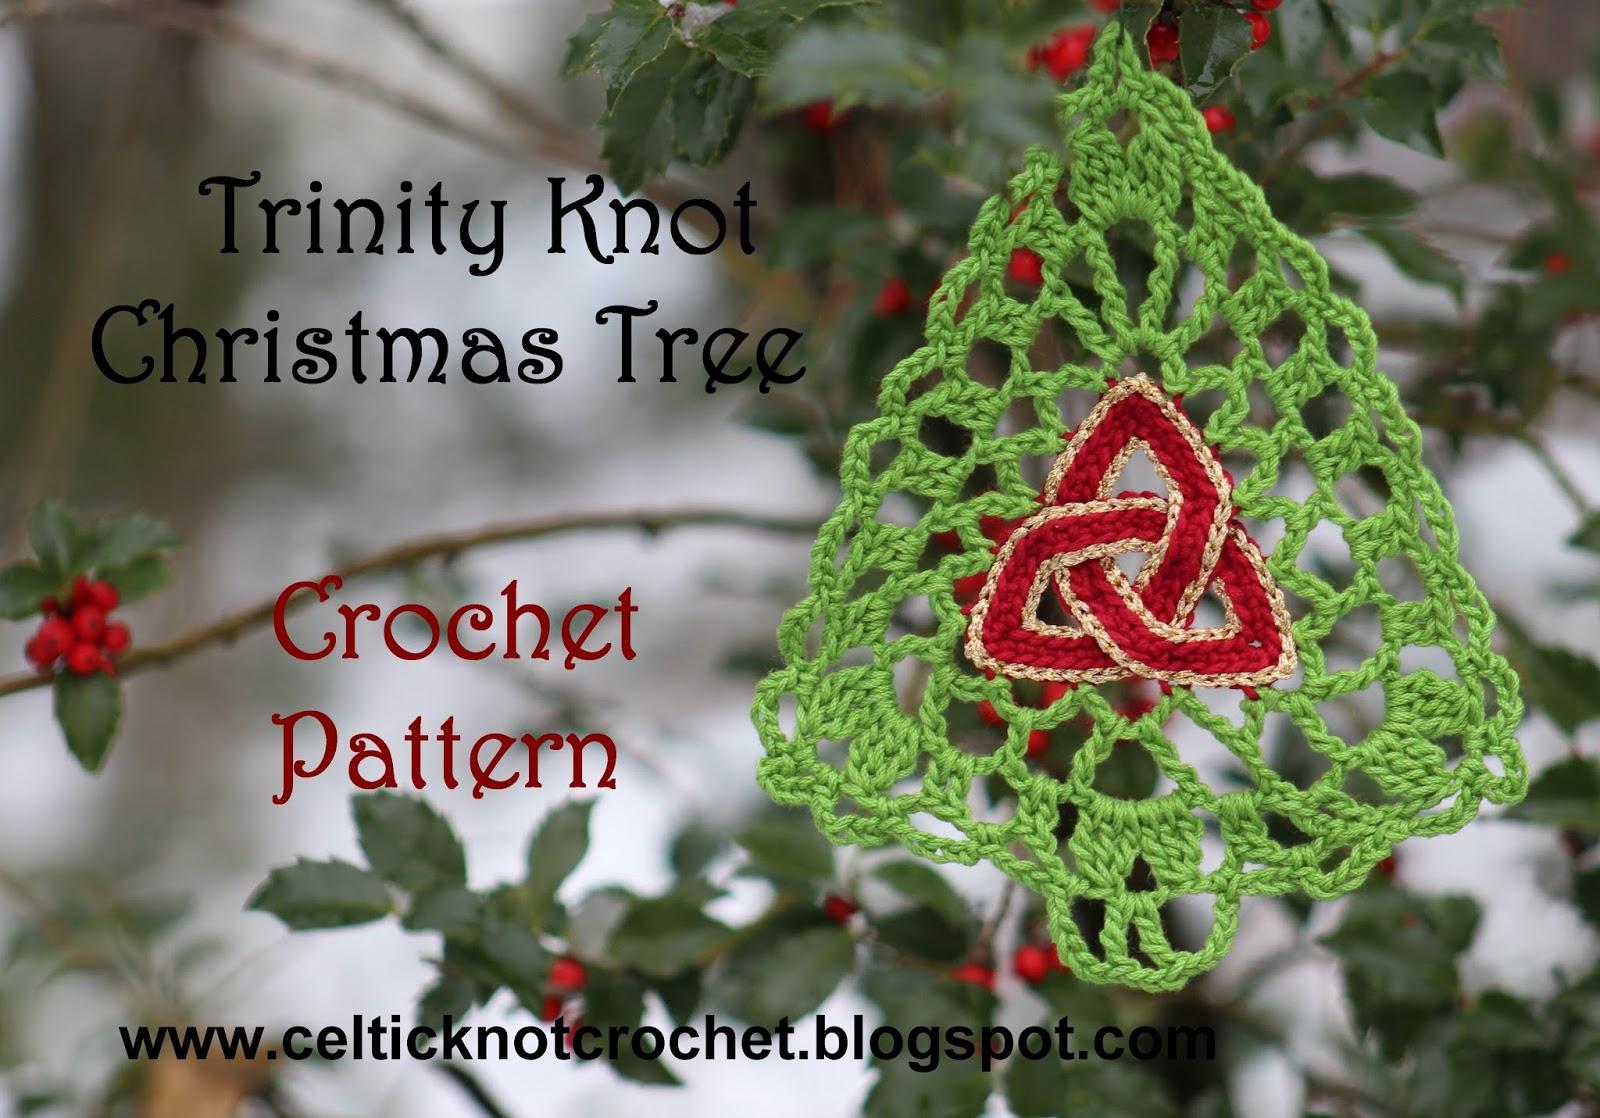 Celtic Knot Crochet Designs Celtic Knot Crochet